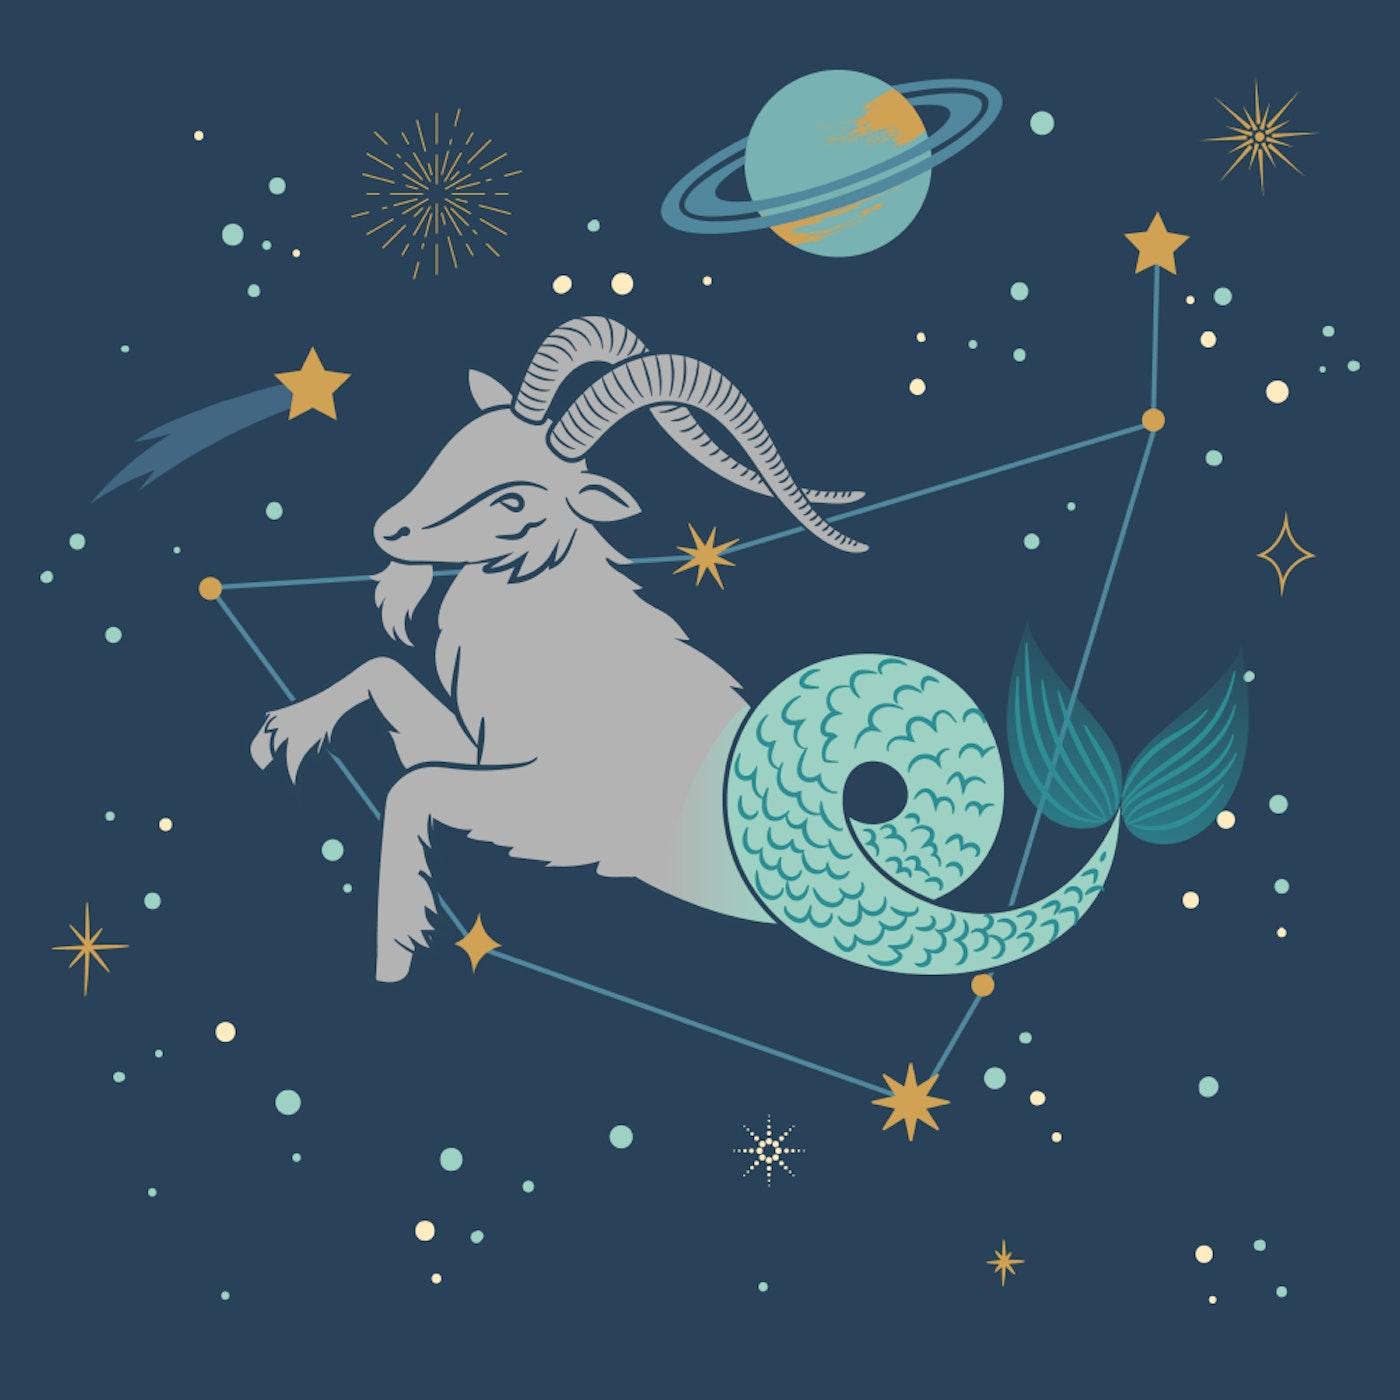 ramalan zodiak capricorn 2021